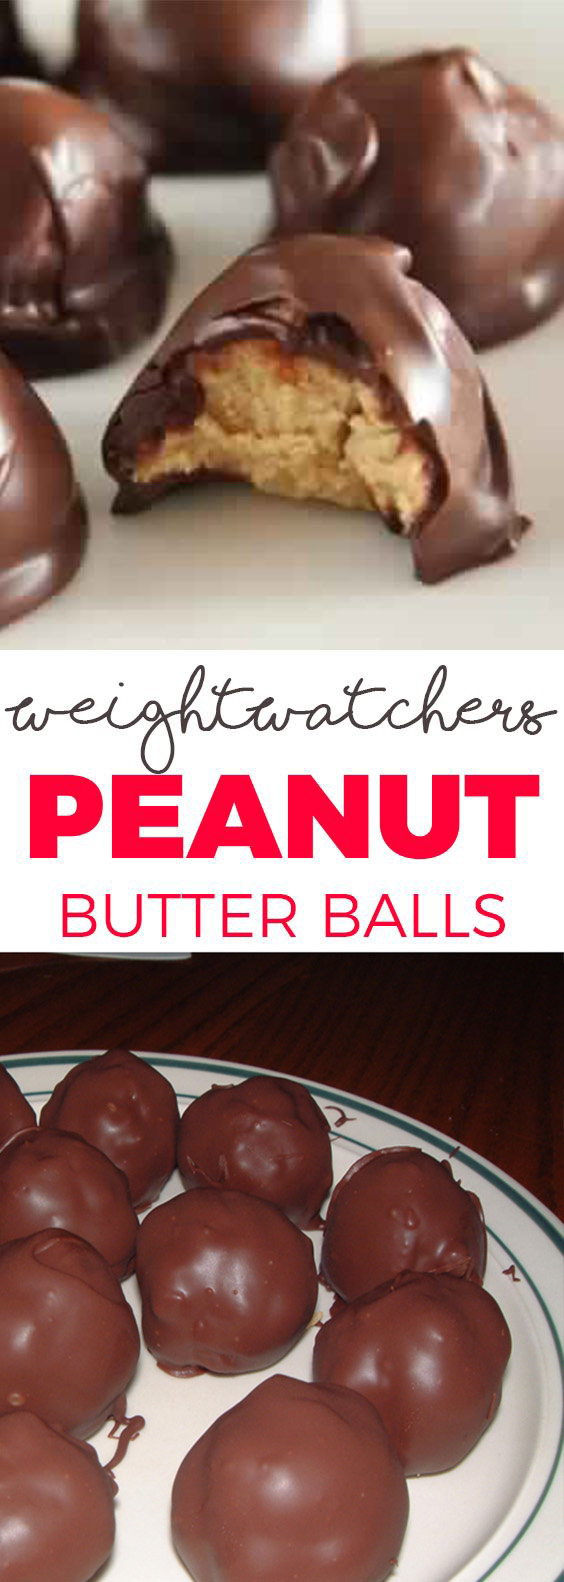 Peanut butter balls – 2 SmartPoints